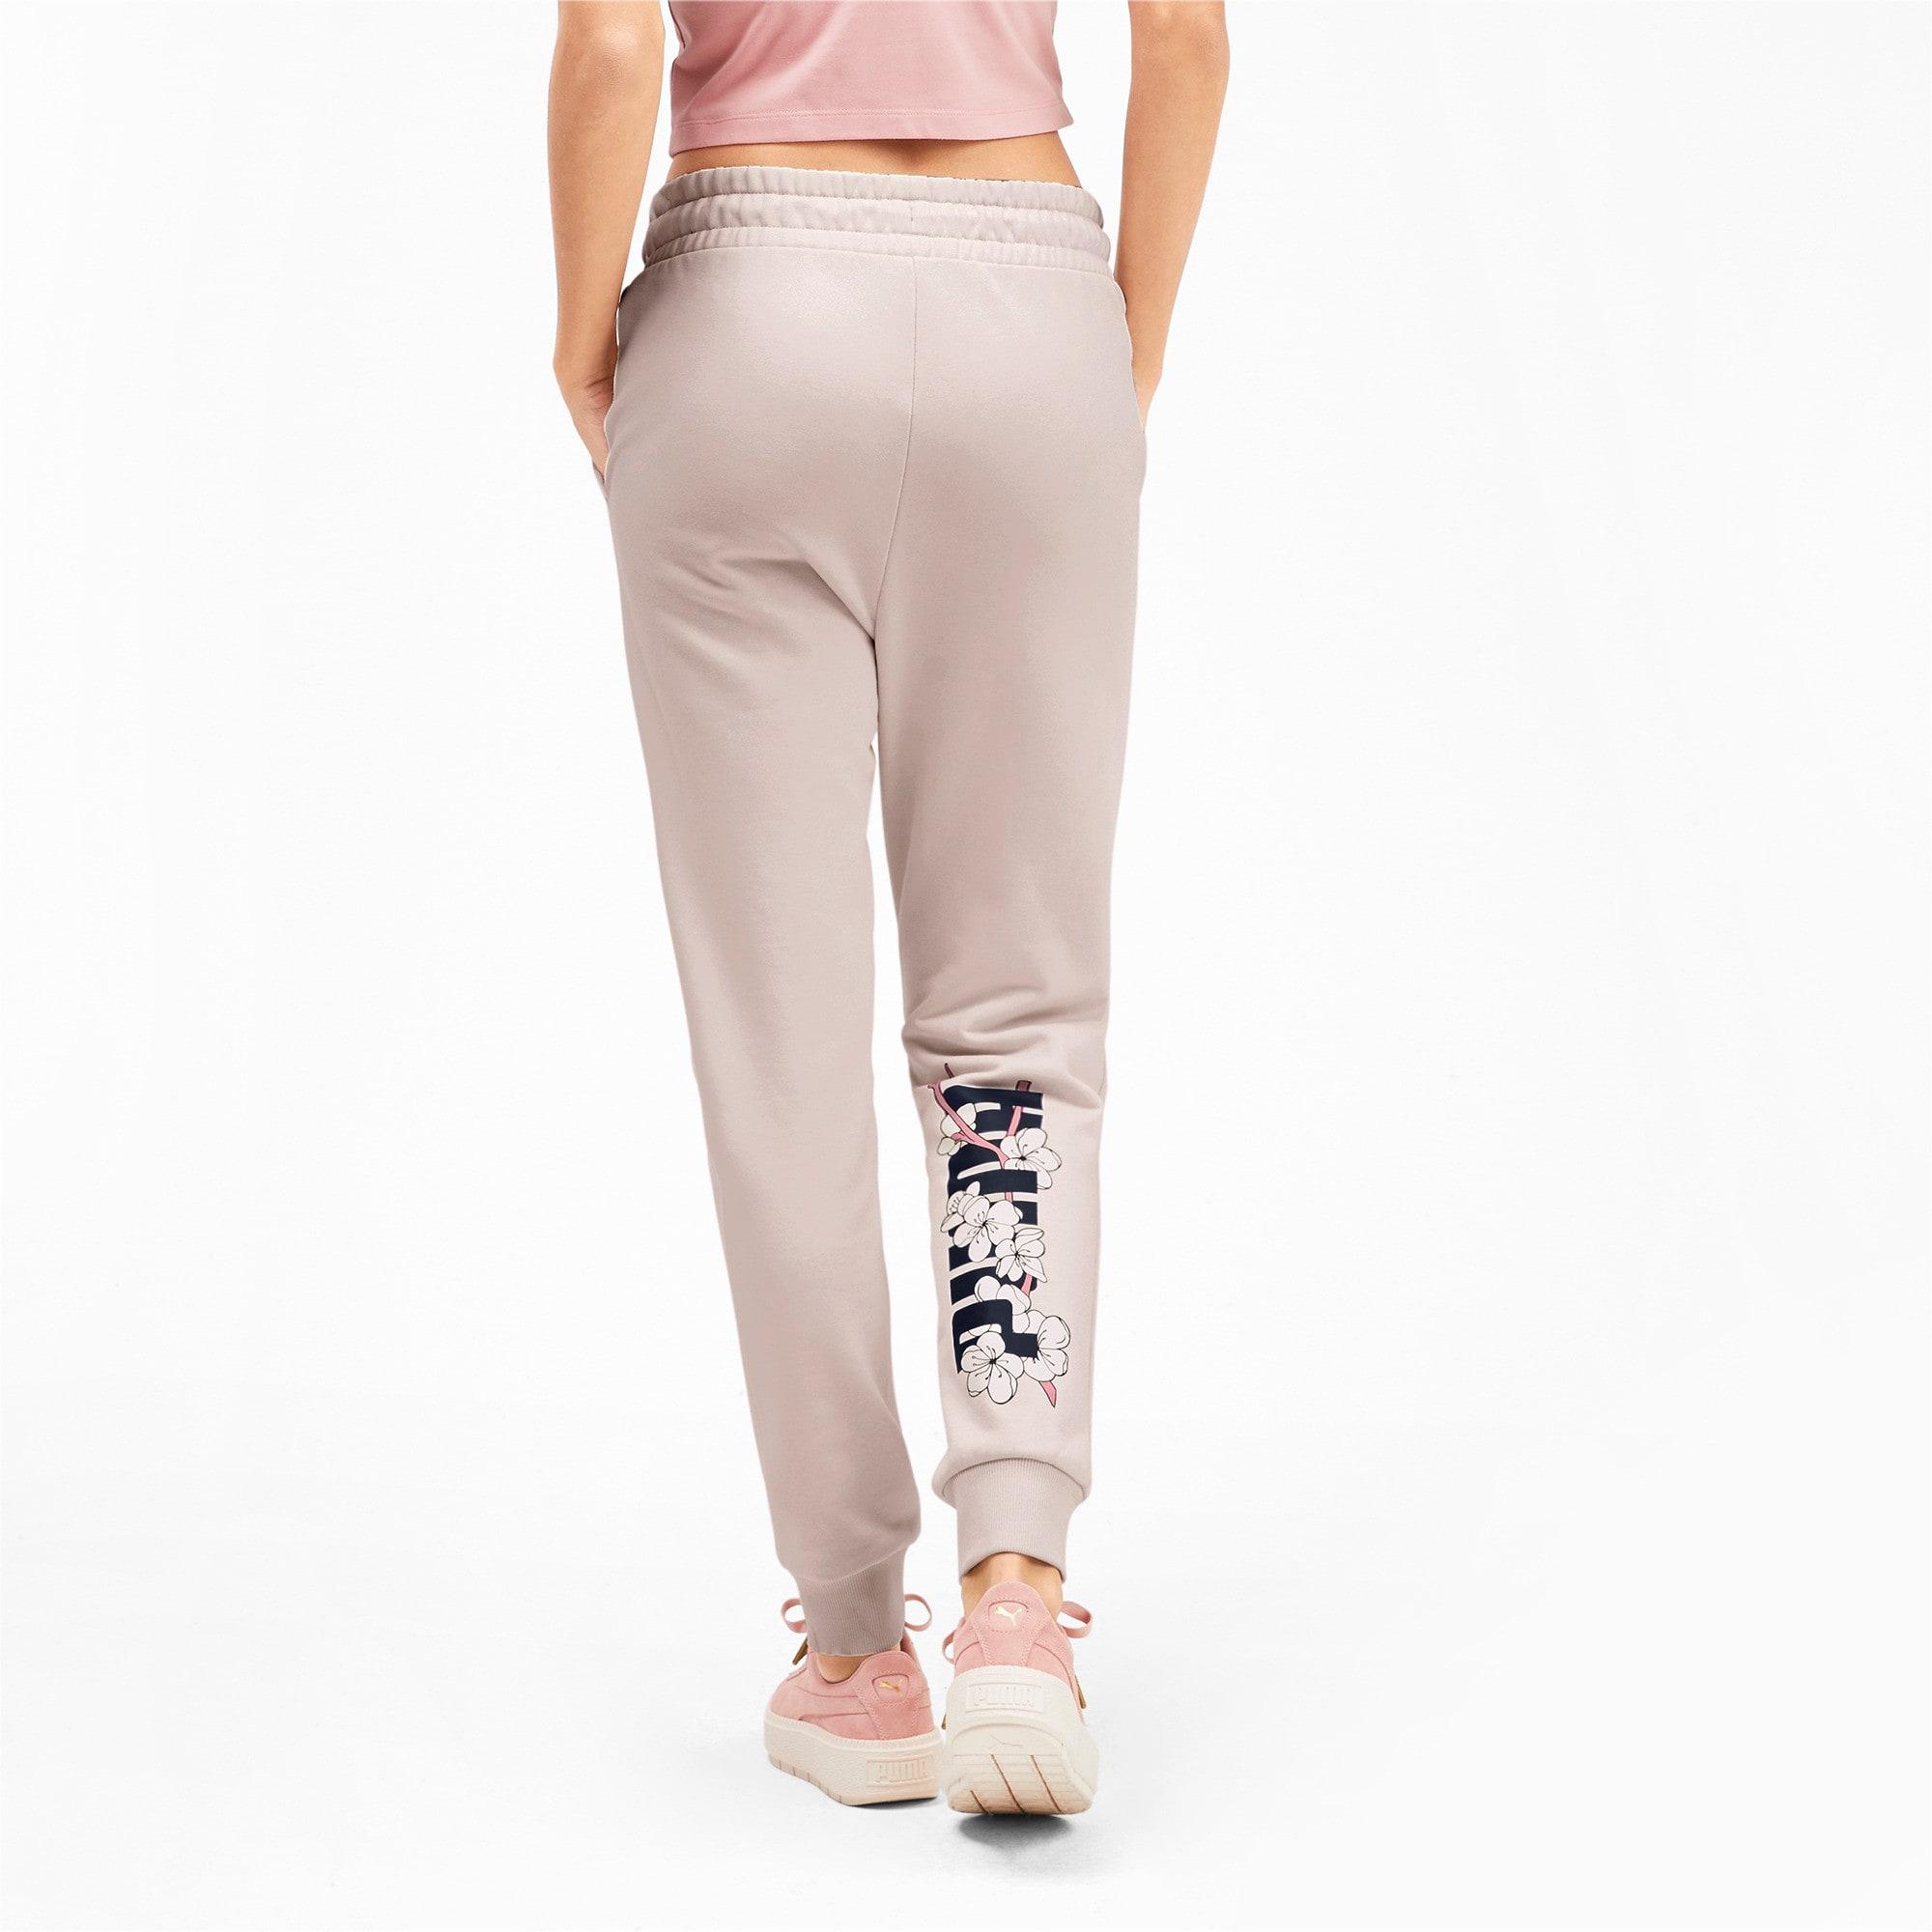 Miniatura 3 de Pantalones deportivosSakurapara mujer, Pastel Parchment, mediano